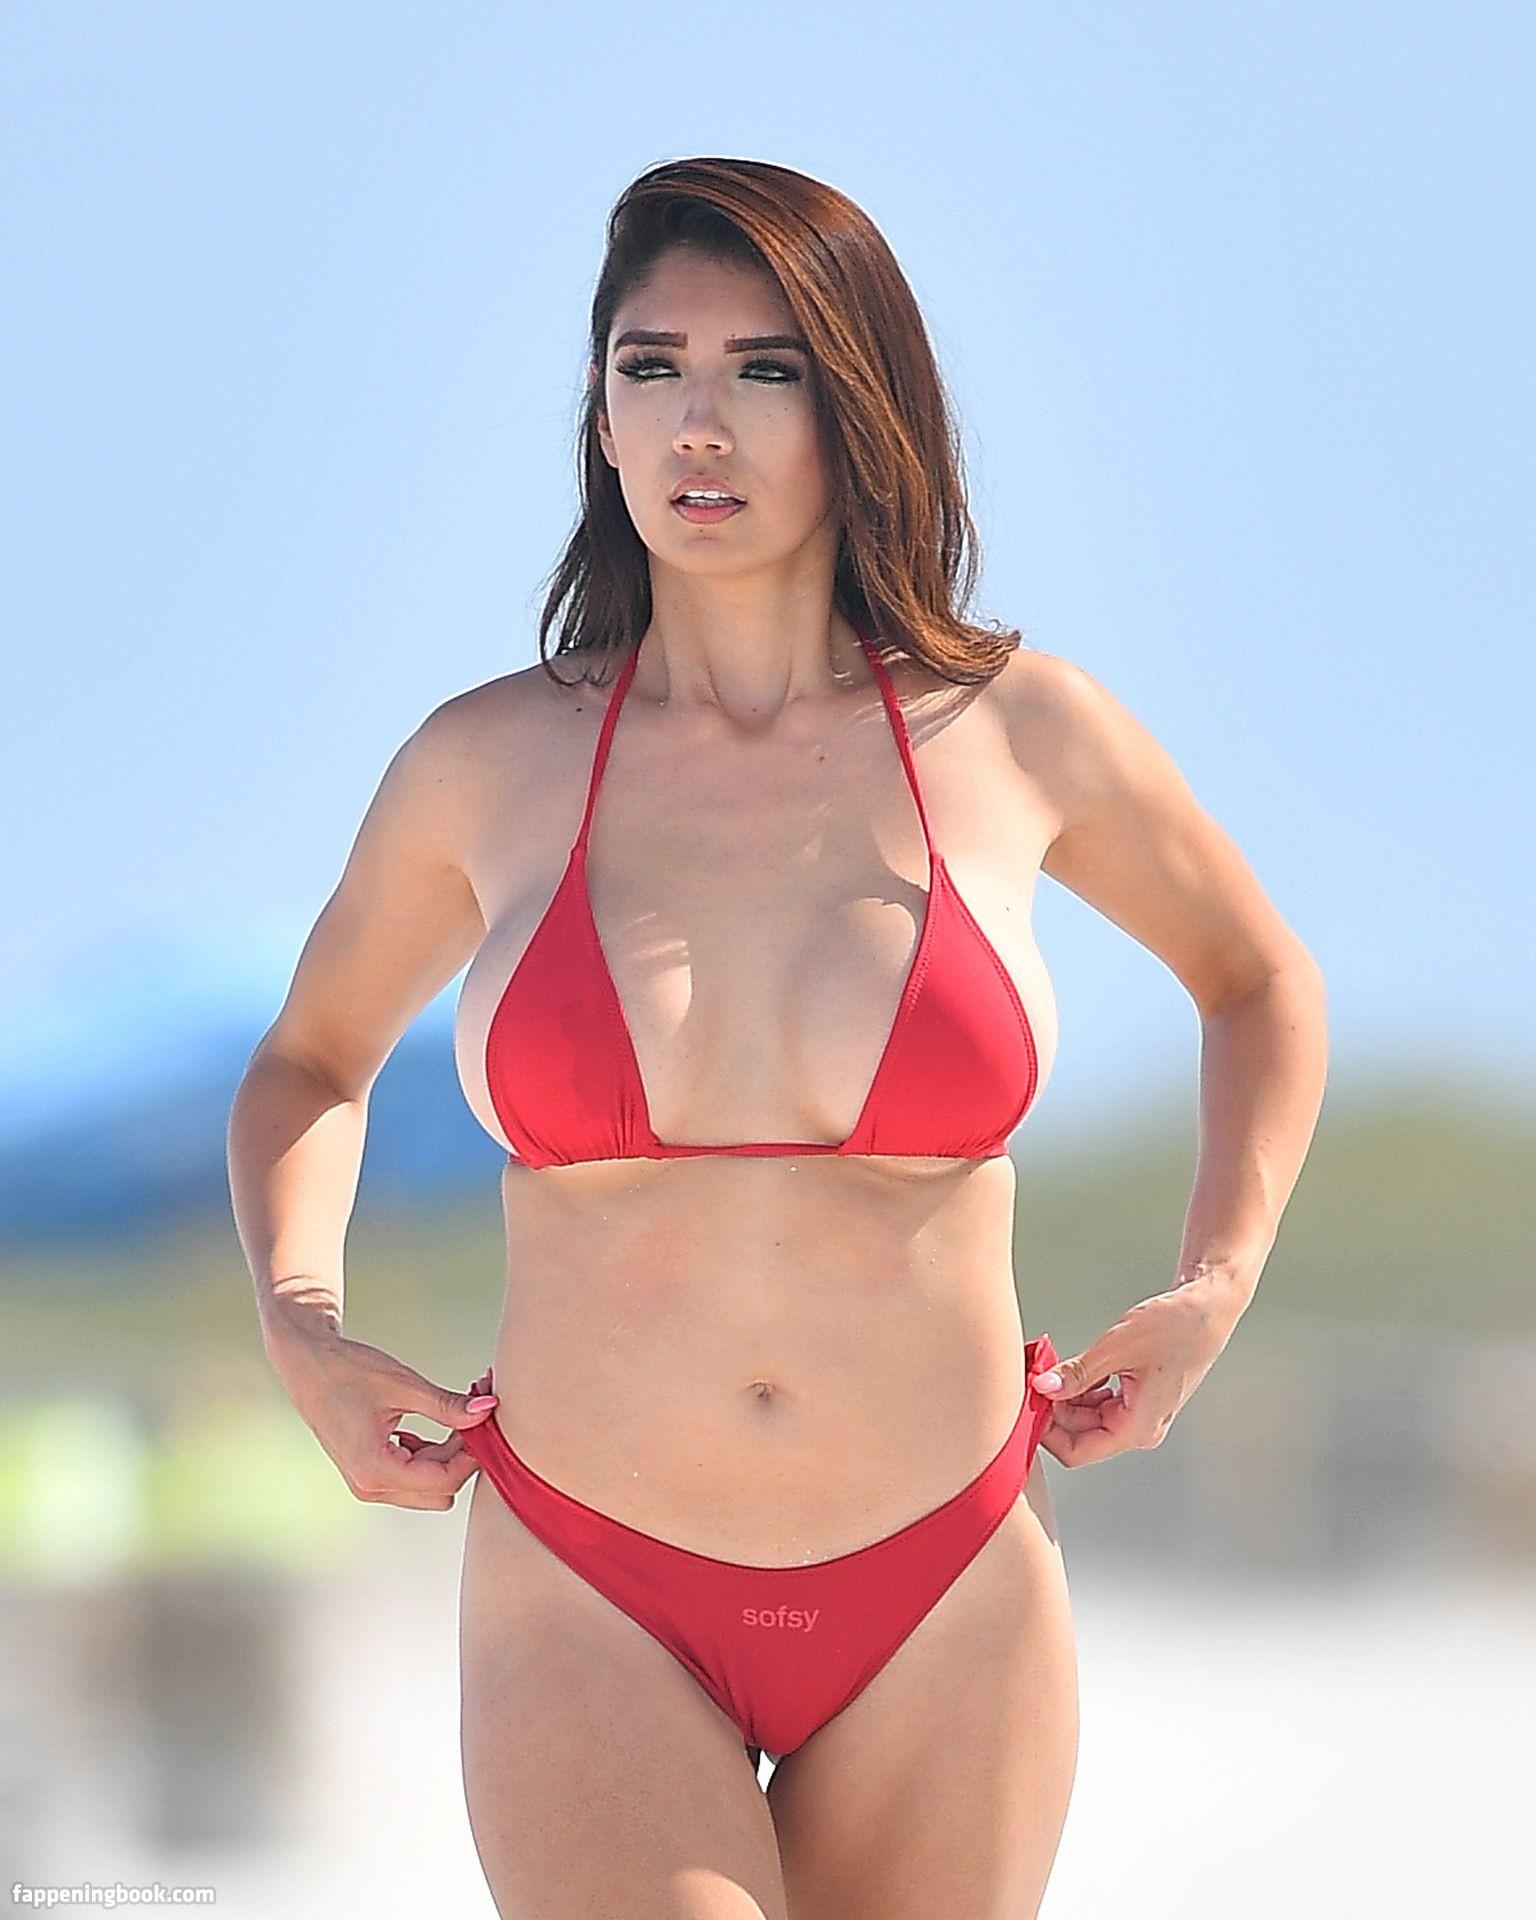 Angela Vazquez Nude diana vazquez nude, sexy, the fappening, uncensored - photo